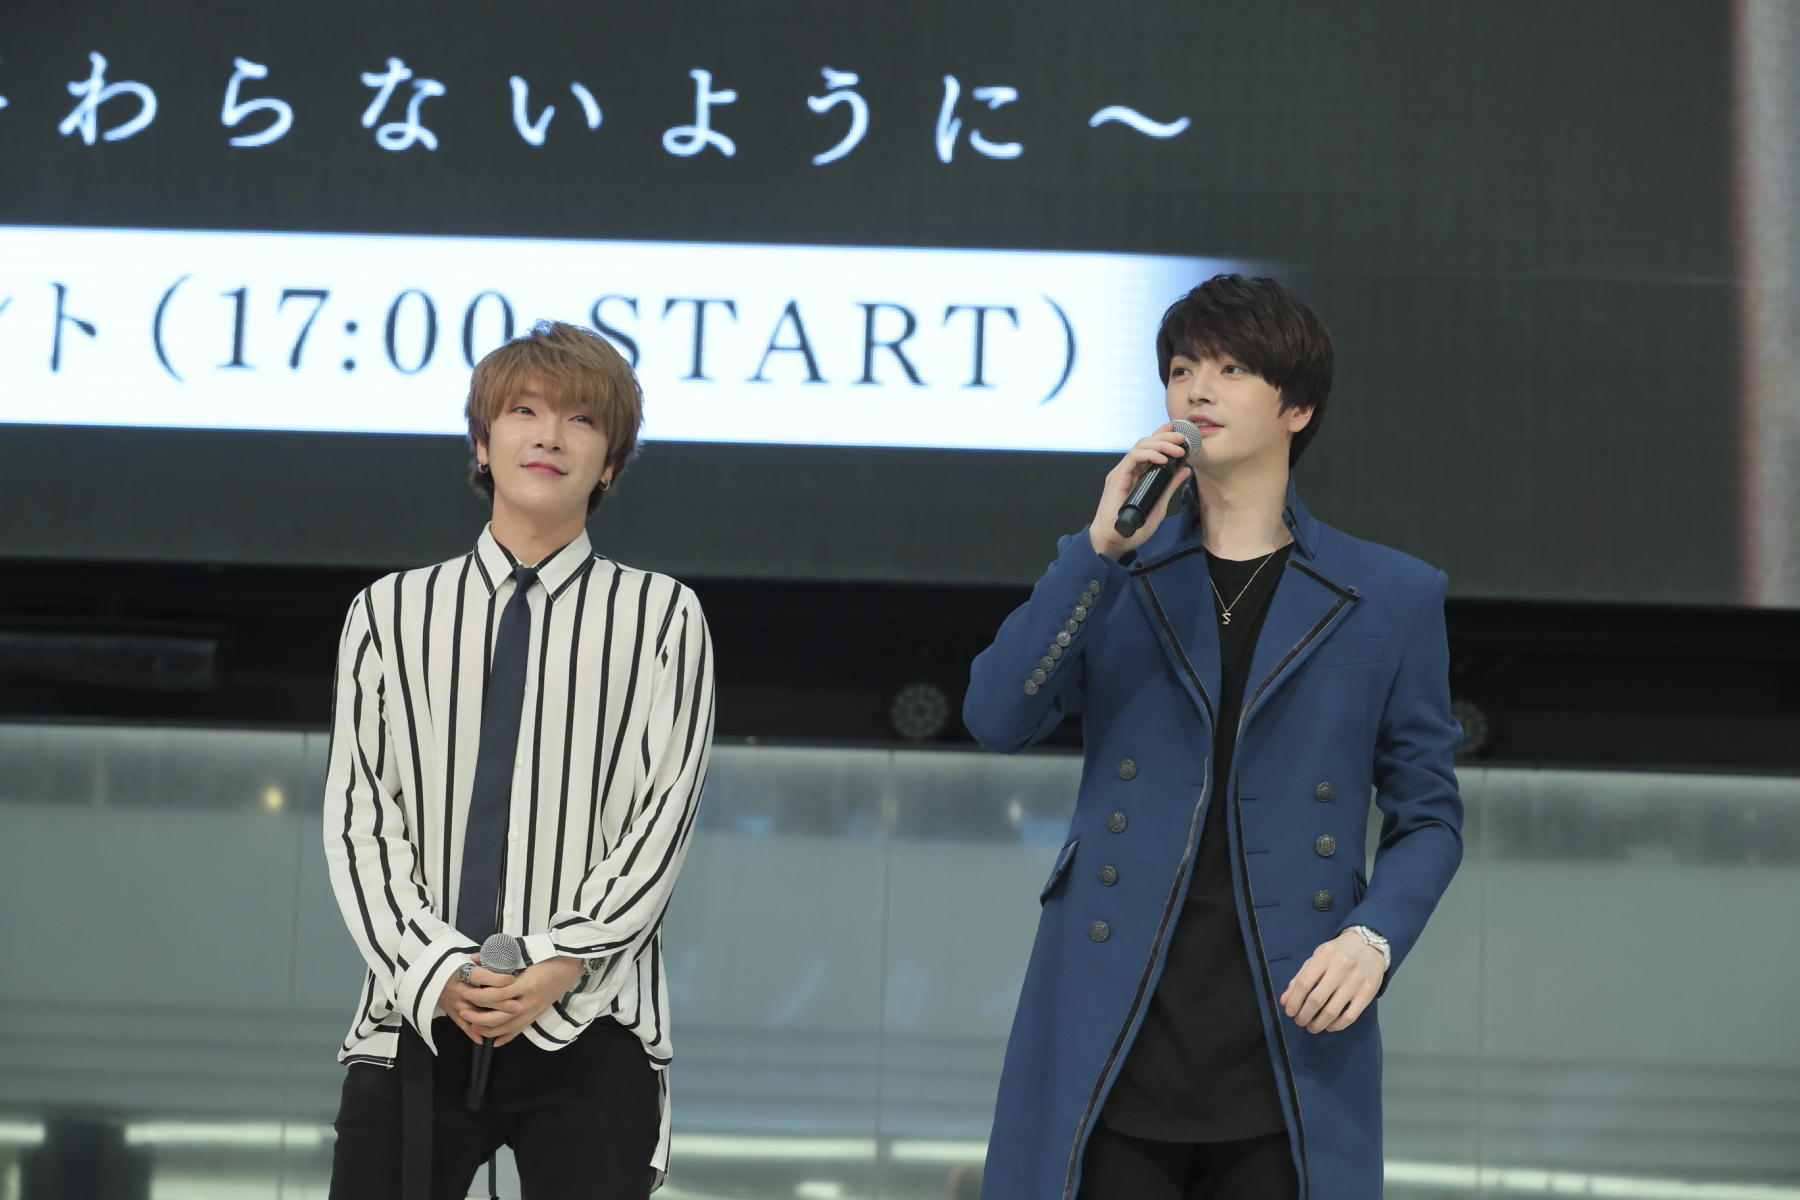 http://news.yoshimoto.co.jp/20180309090258-e546a5790481eed4b89110a268e16c82730e9203.jpg